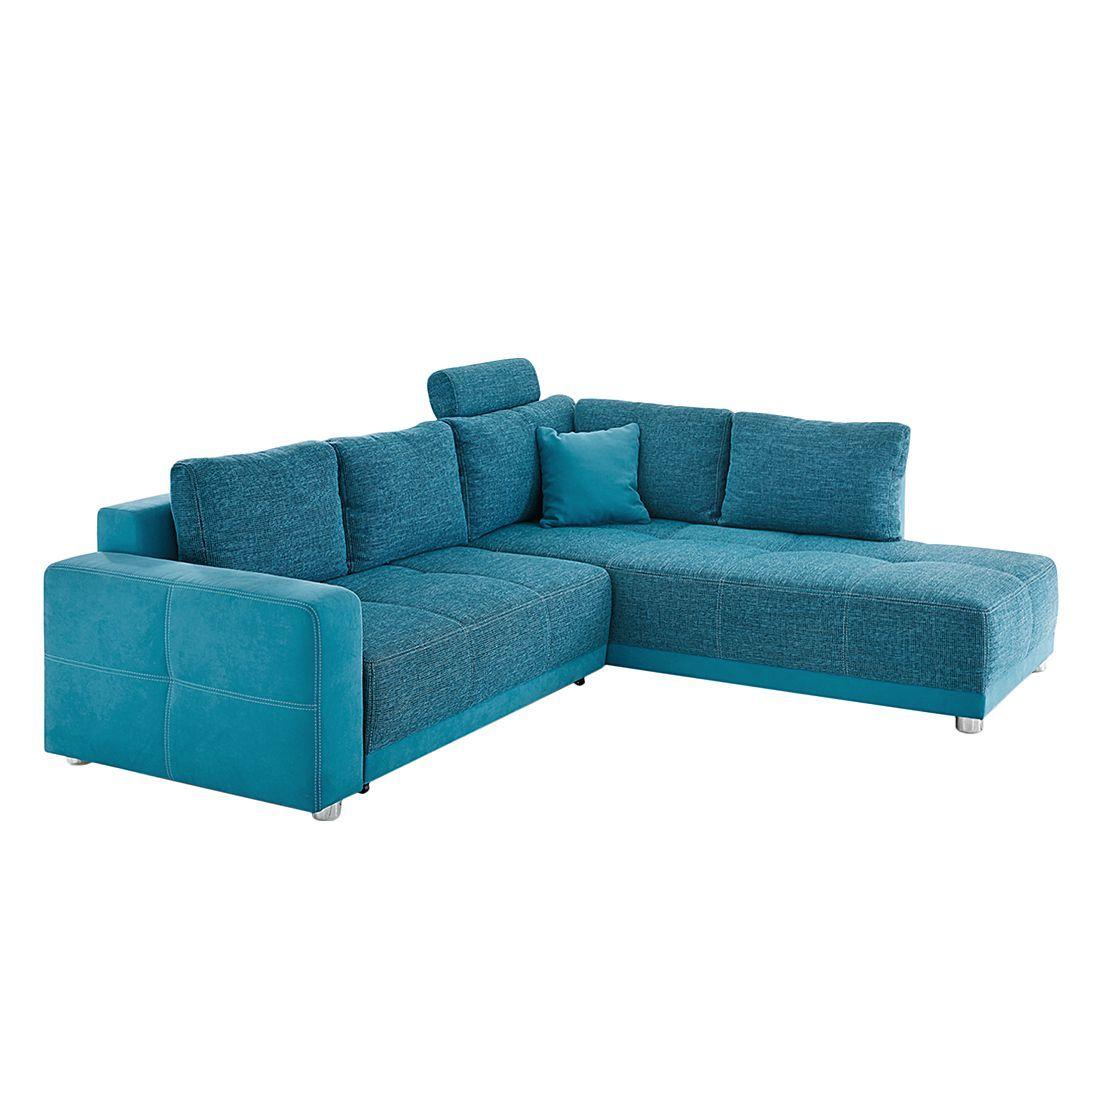 Moderne Sofas Online Kaufen Schlafsofa Ecksofa Federkern Sofa